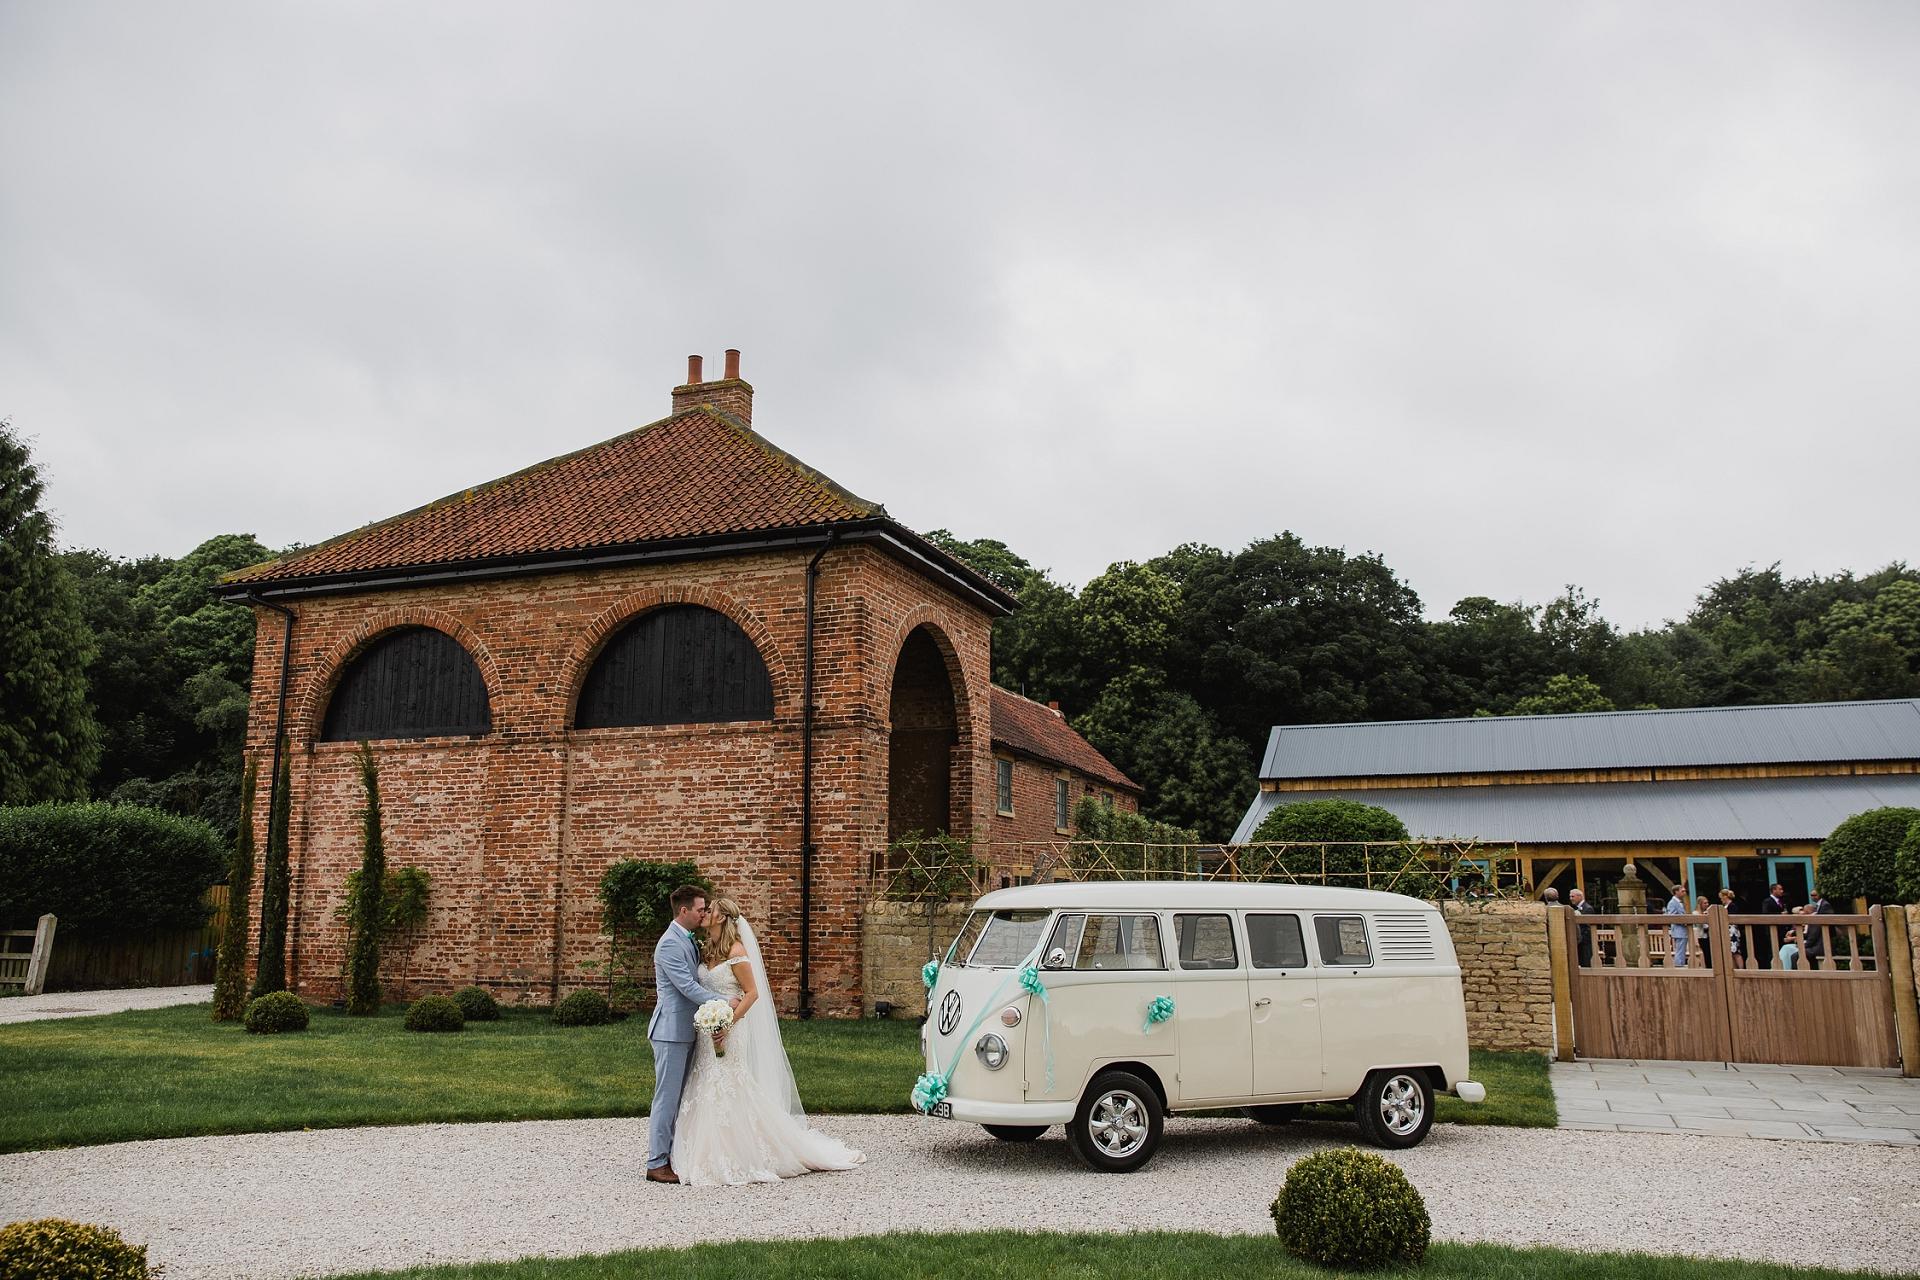 Wedding photography at Hazel Gap Barn